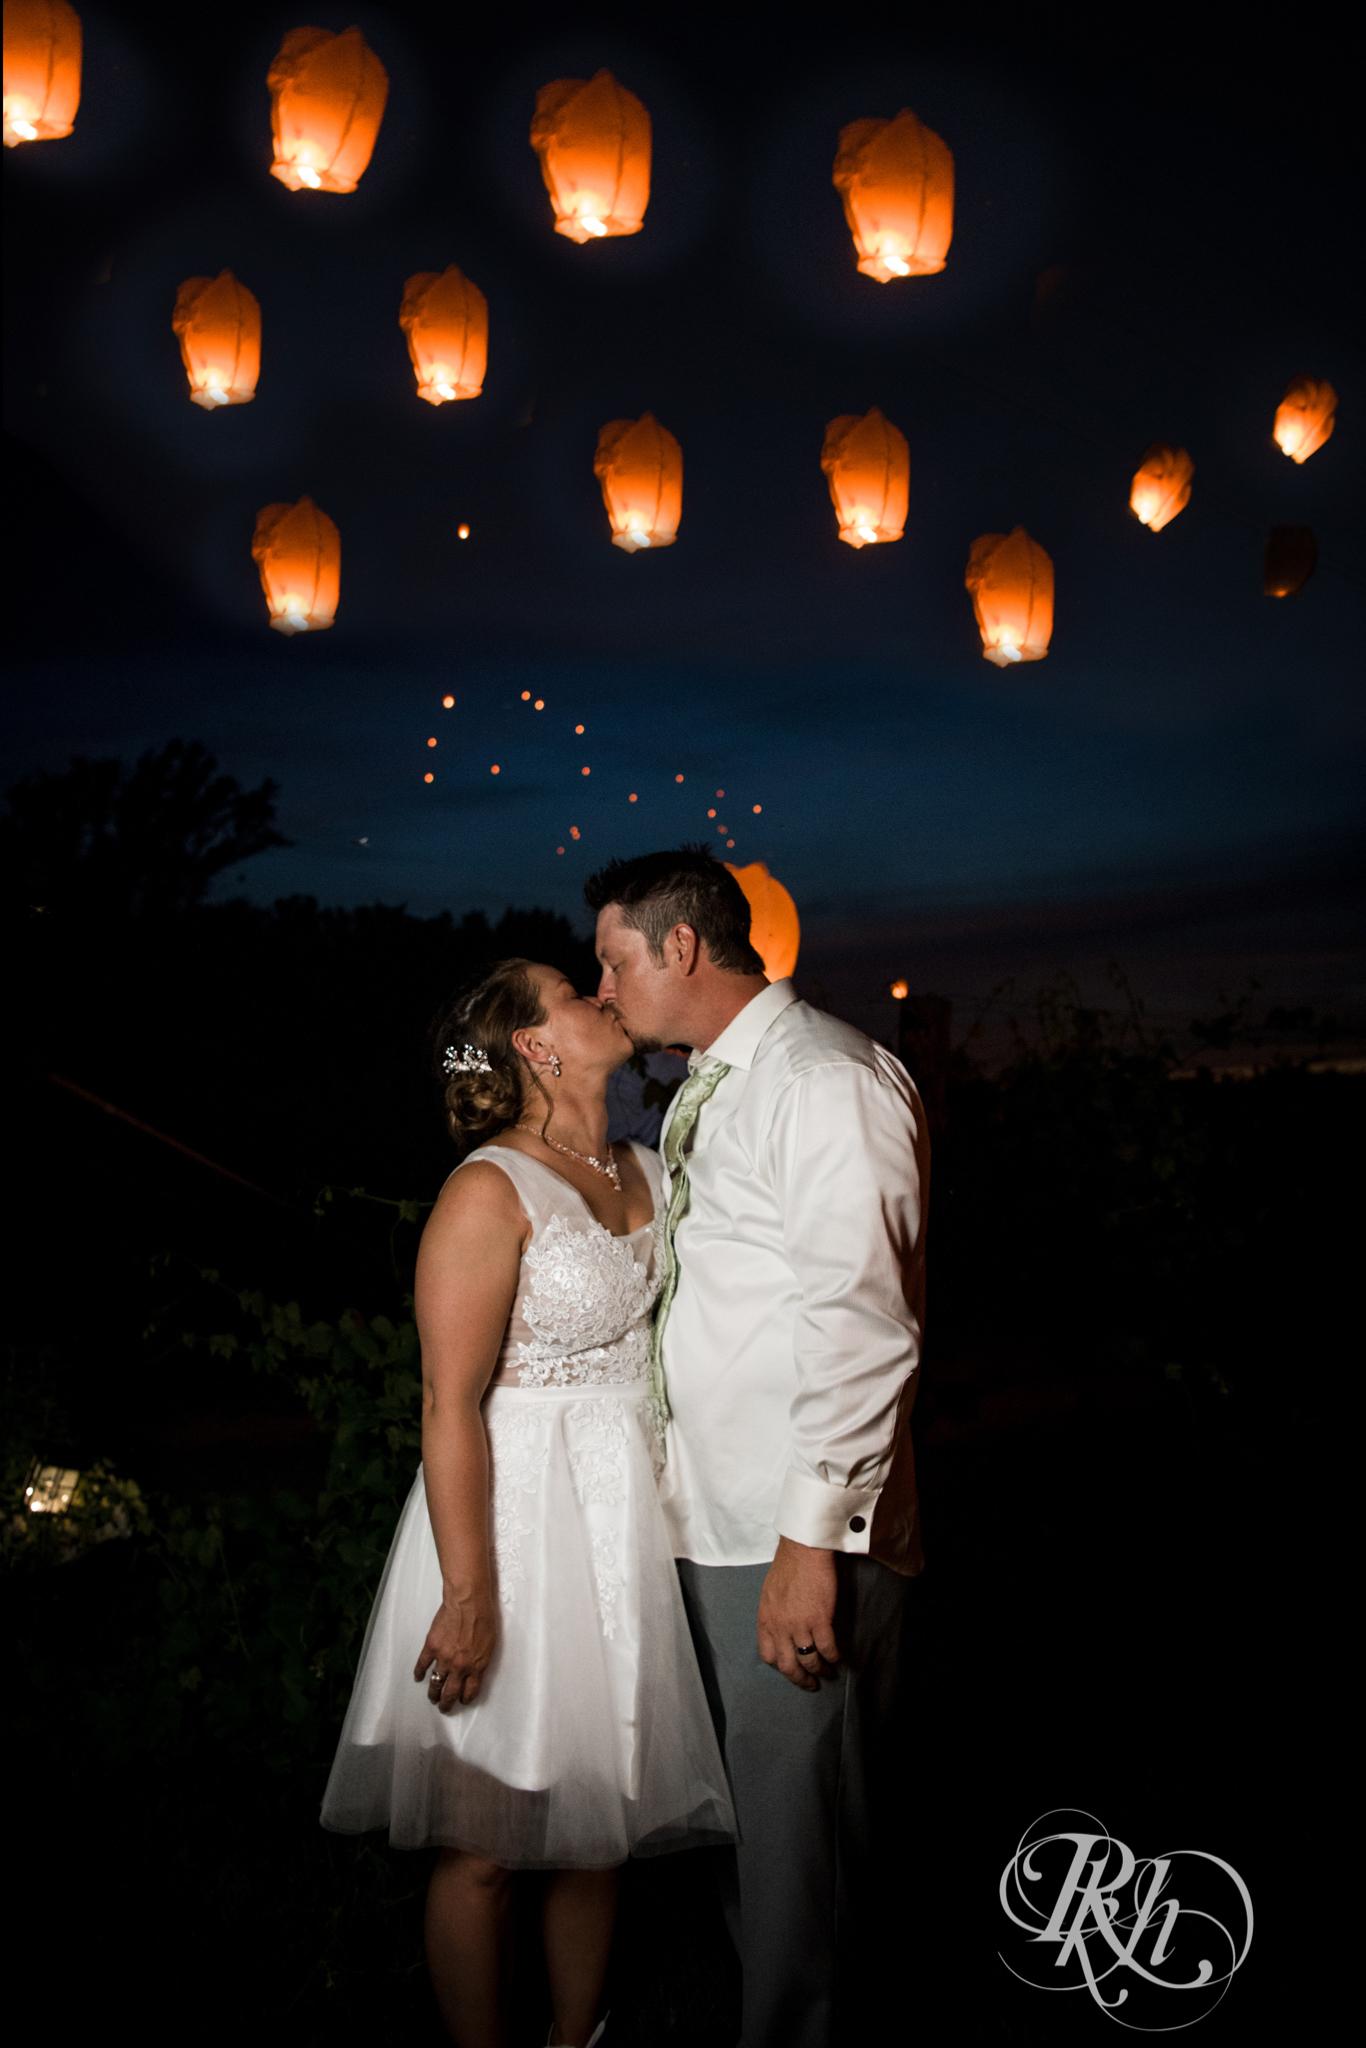 Ally & Nick - Minnesota Wedding Photography - Next Chapter Winery - RKH Images - Blog (57 of 57).jpg